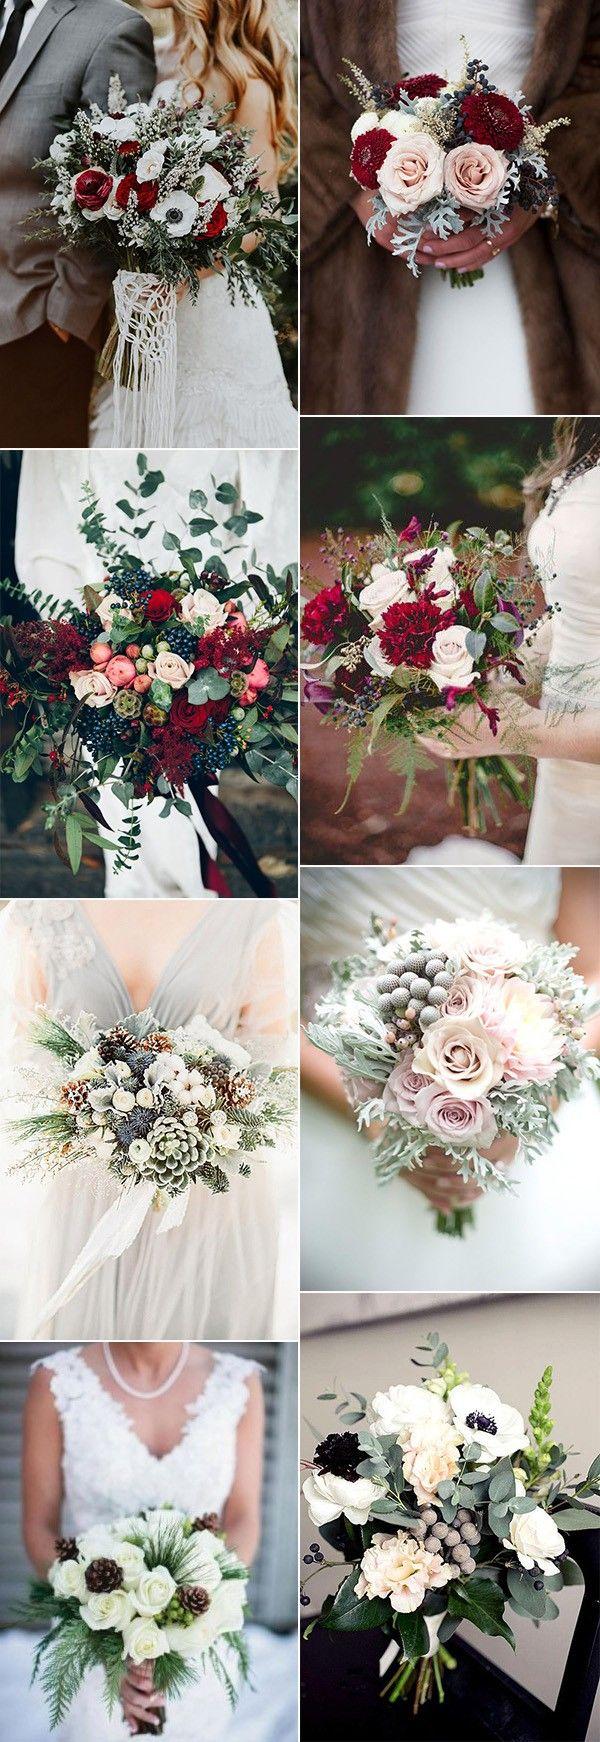 wedding bouquets for winter wedding ideas 2017